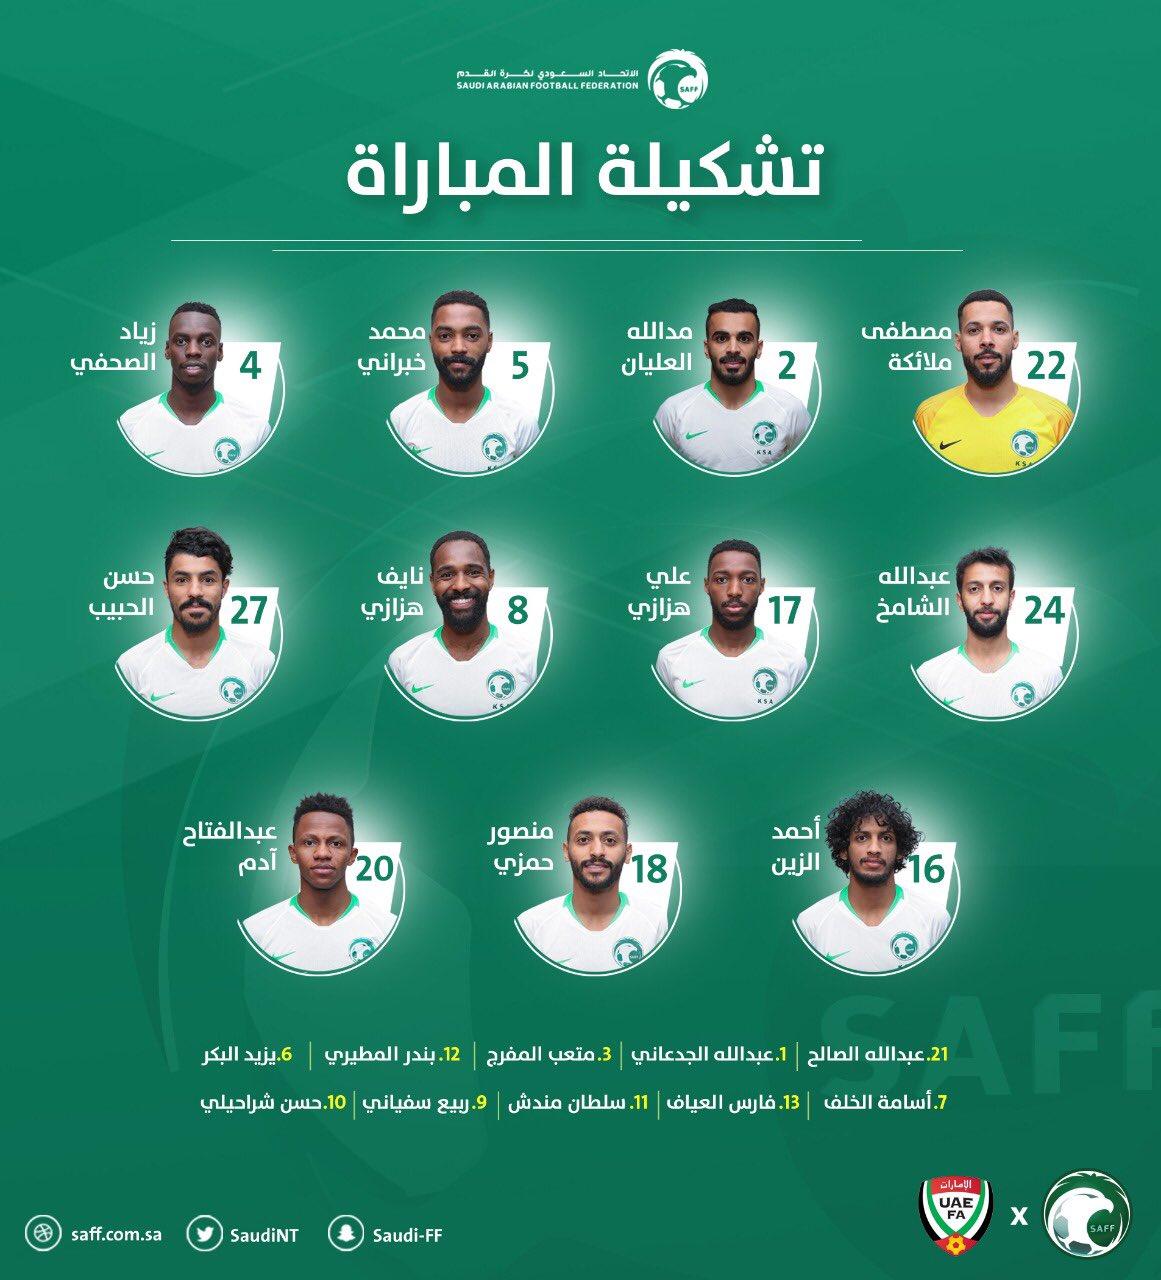 Saudi Arabia National Football Team - Twitter Photo